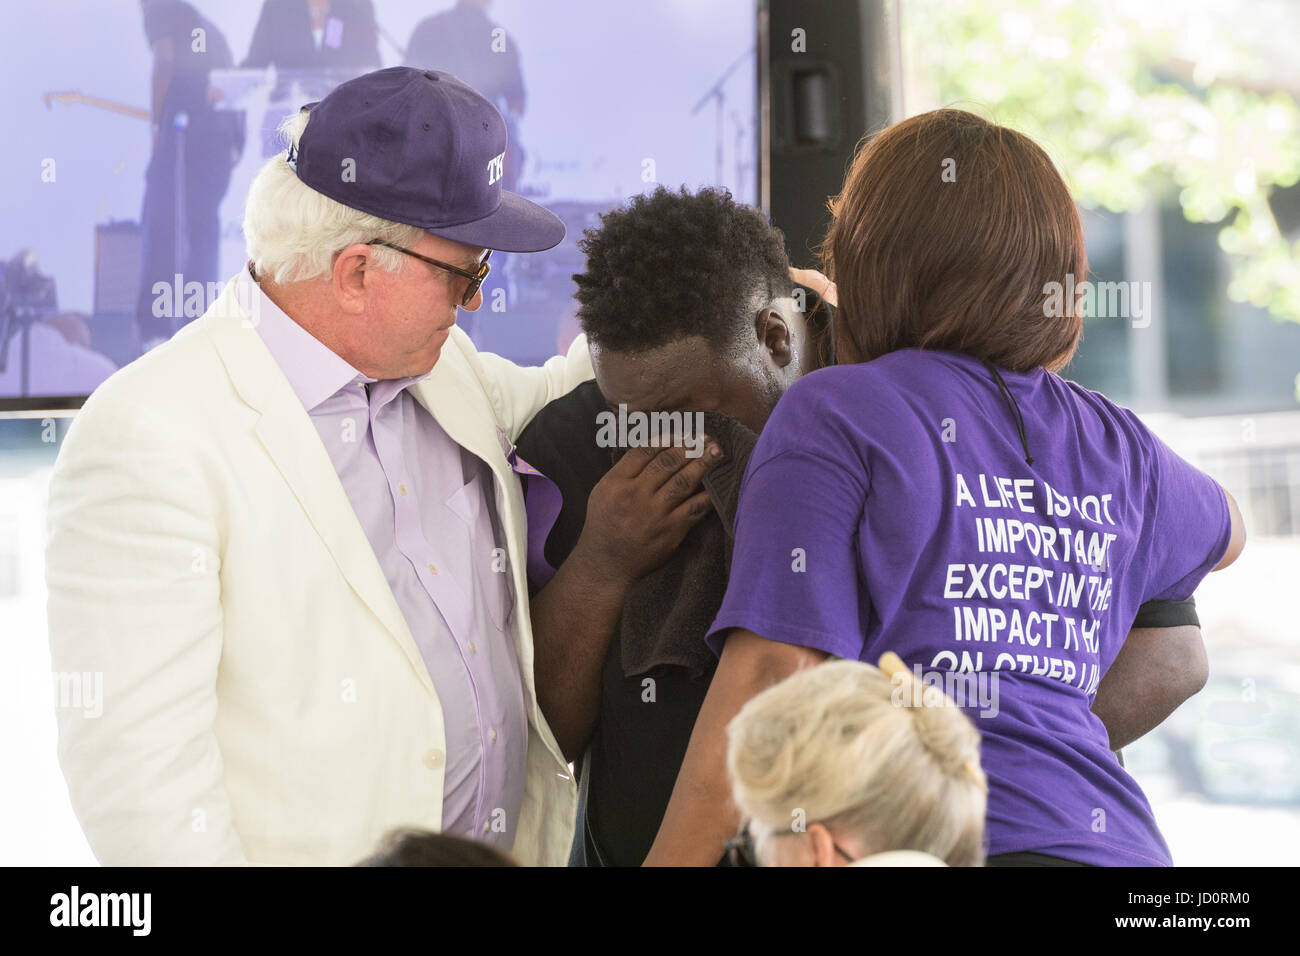 Charleston, South Carolina, USA. 17th June, 2017. Andy Savage, left, Jarell Smalls, center, and Felicia Sanders - Stock Image